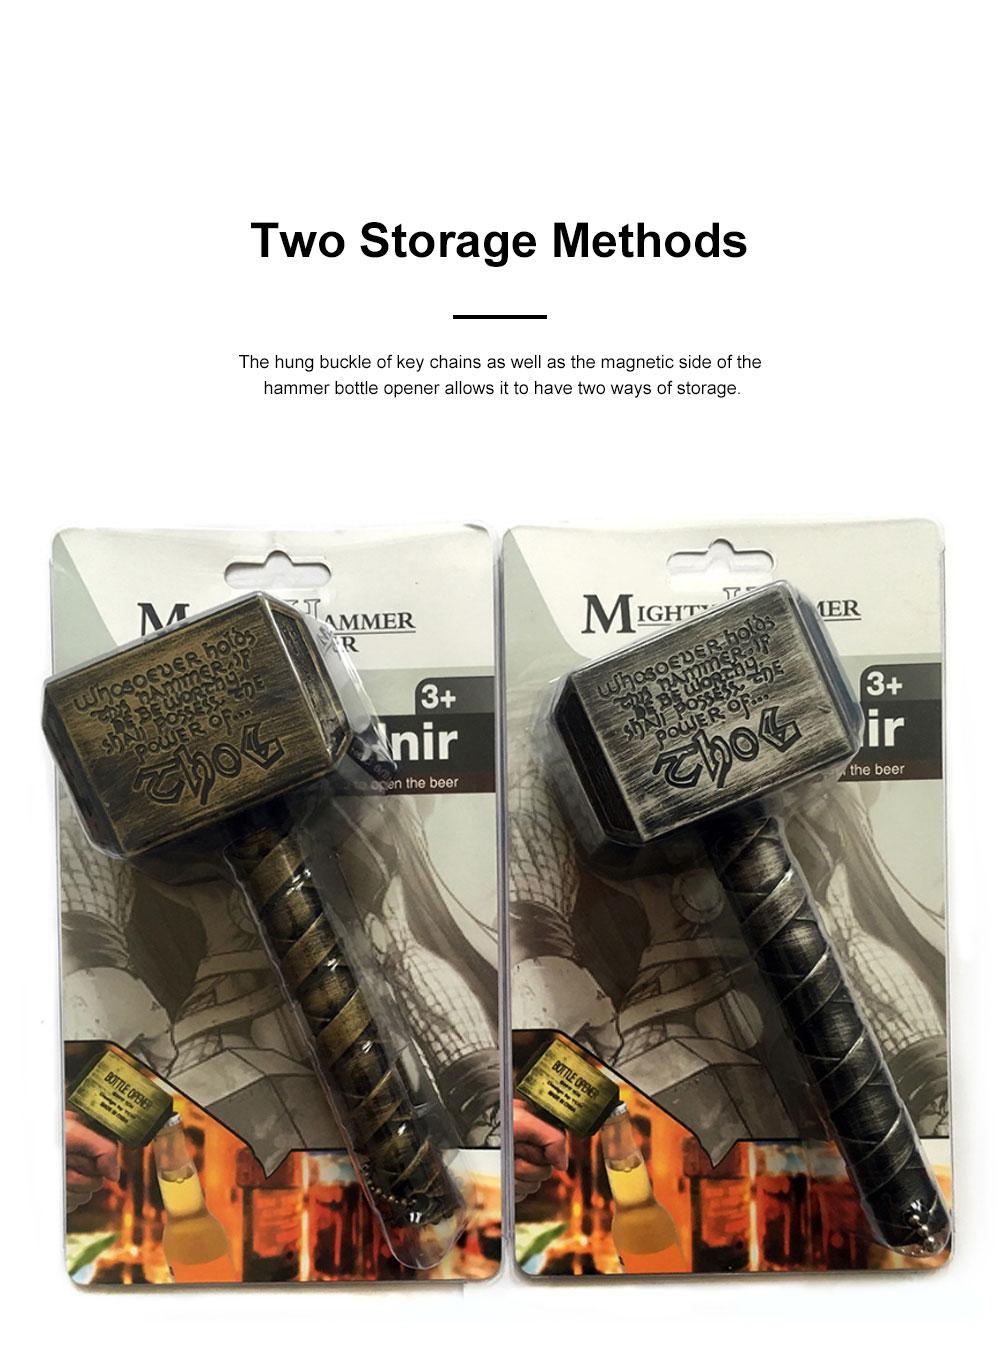 Retro Bottle Opener Raytheon Opener Bottle Opening Shock Resistant Magnetic Screwdriver Hammer Designed Durable Easy to Use Screw Driver Bottle Opener 5